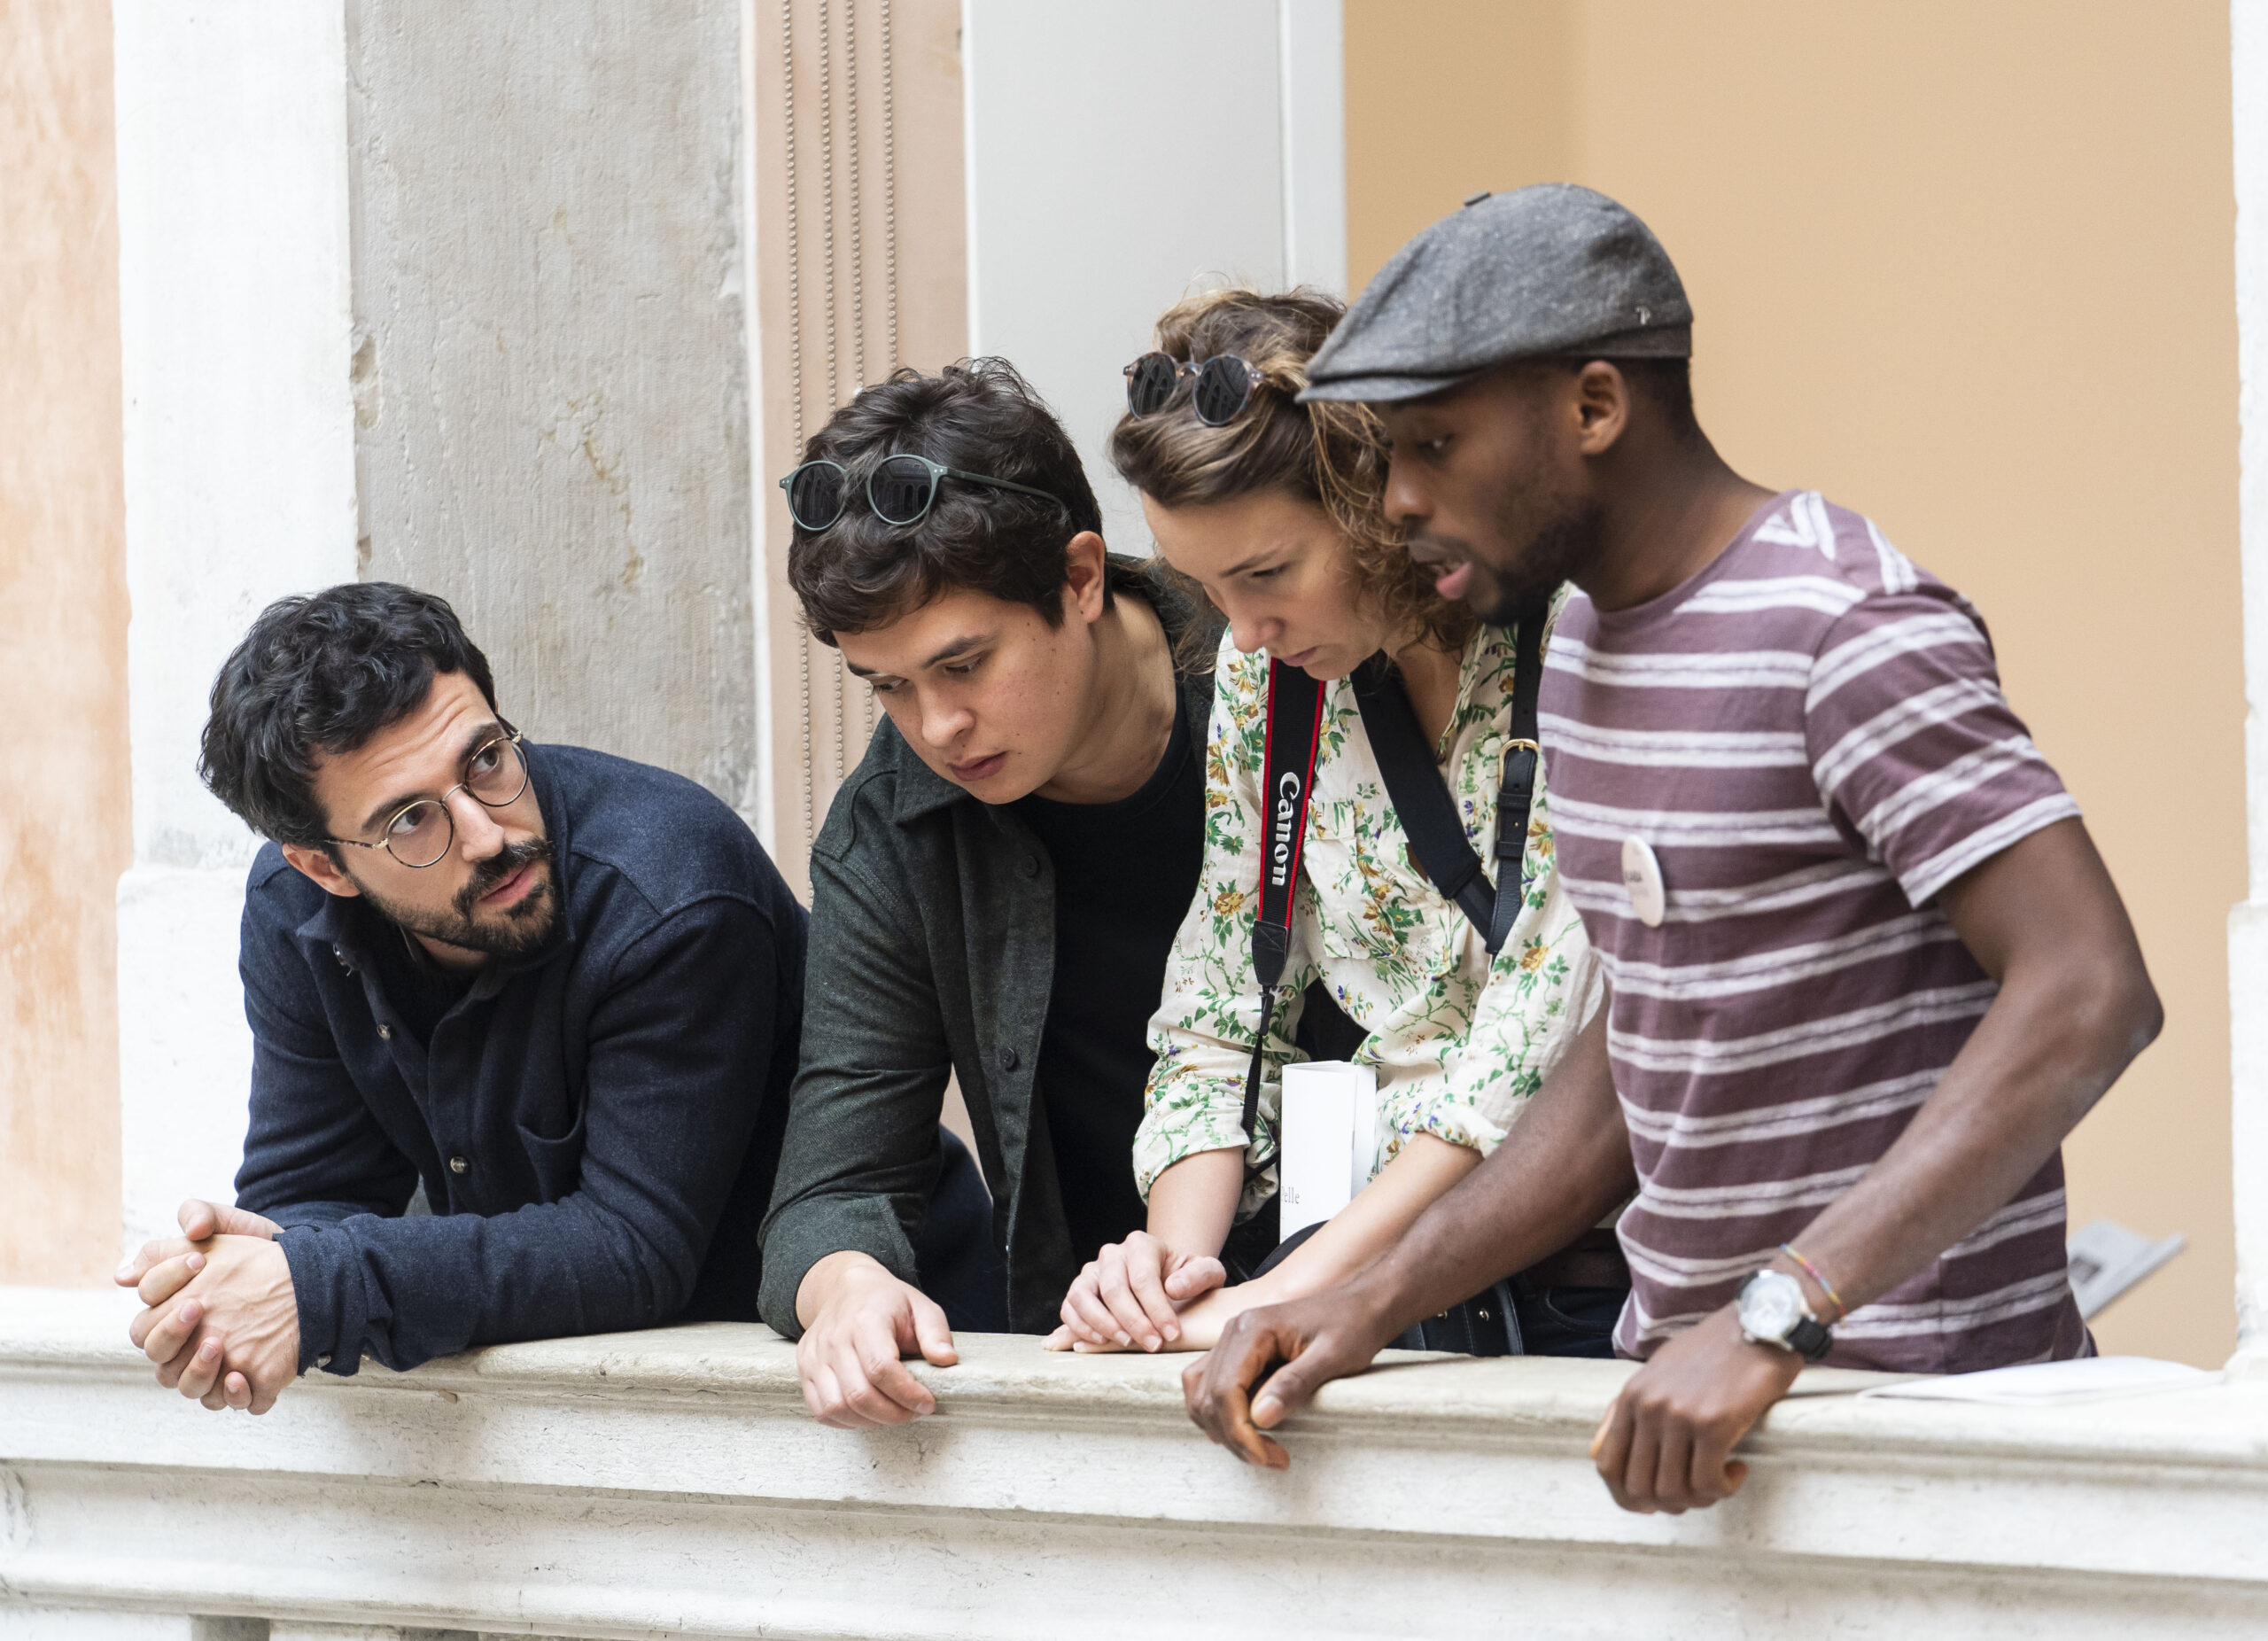 Torna Altri Sguardi a Venezia: visite guidate speciali con migranti, richiedenti asilo e rifugiati politici